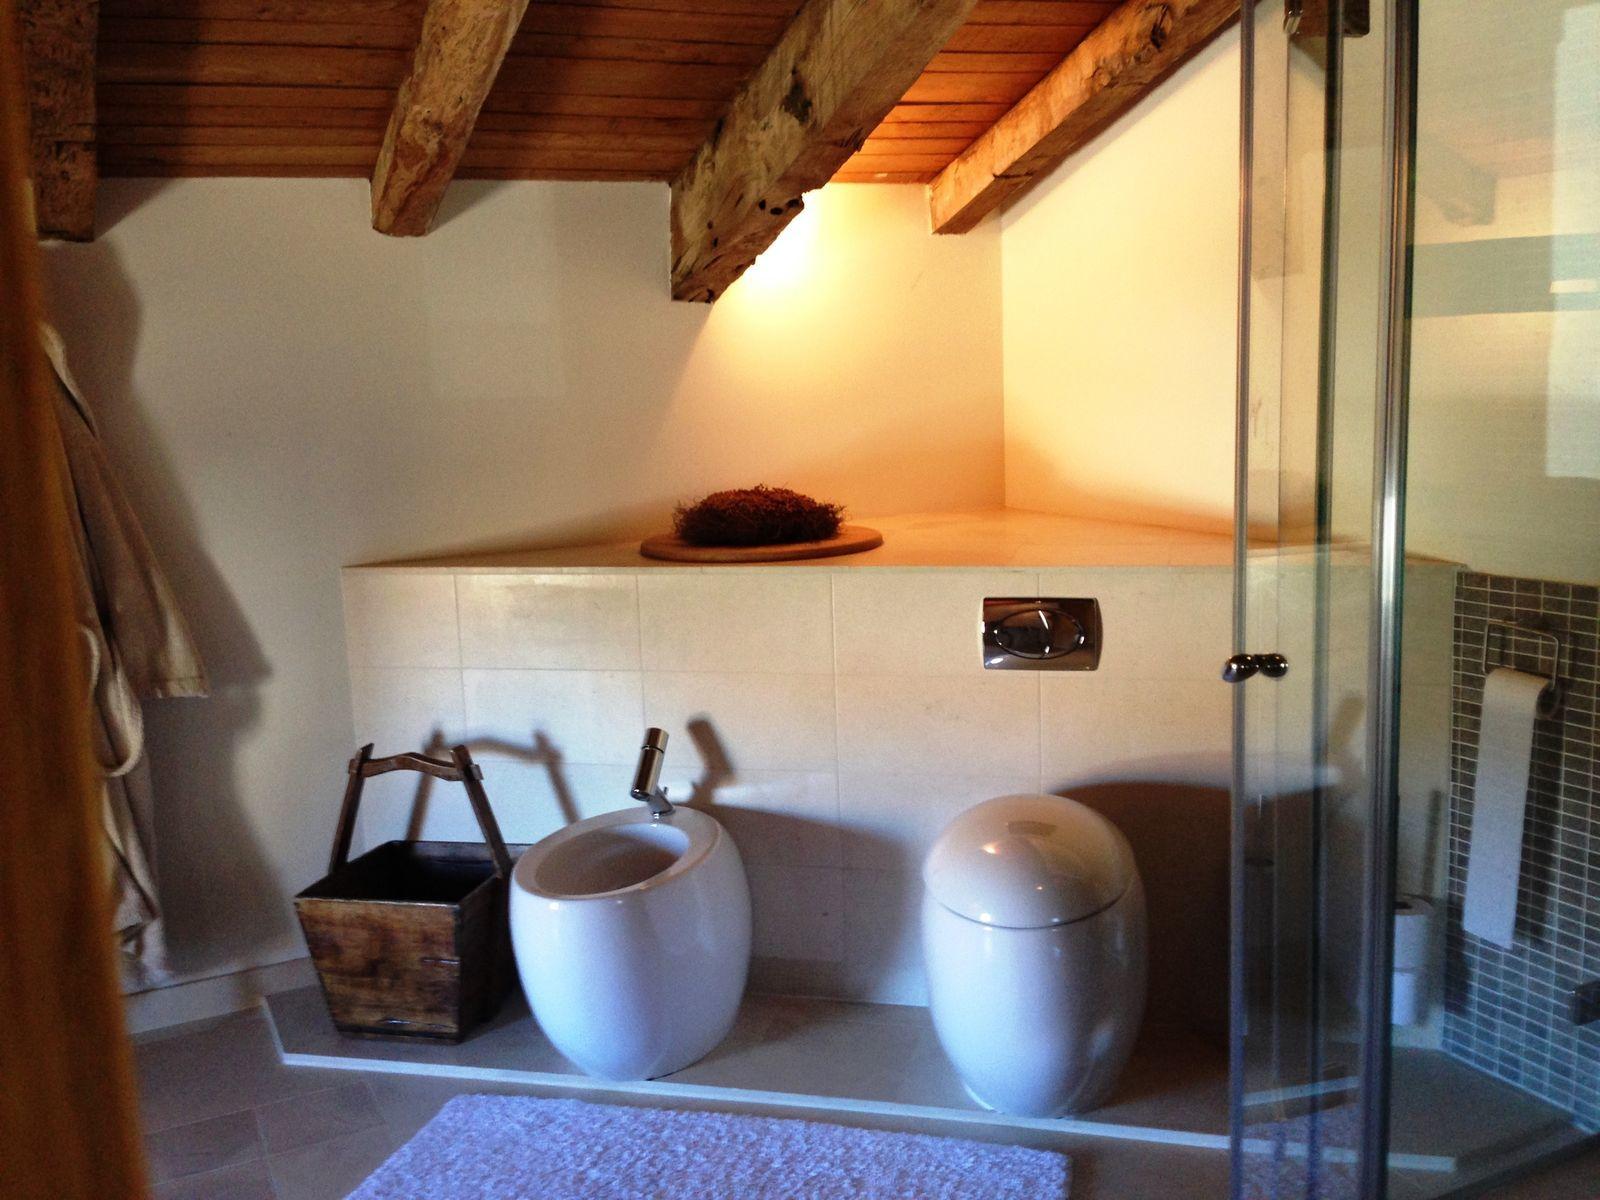 Maison de Chasse - la Grange - luxe vakantiehuis Dordogne, Frankrijk